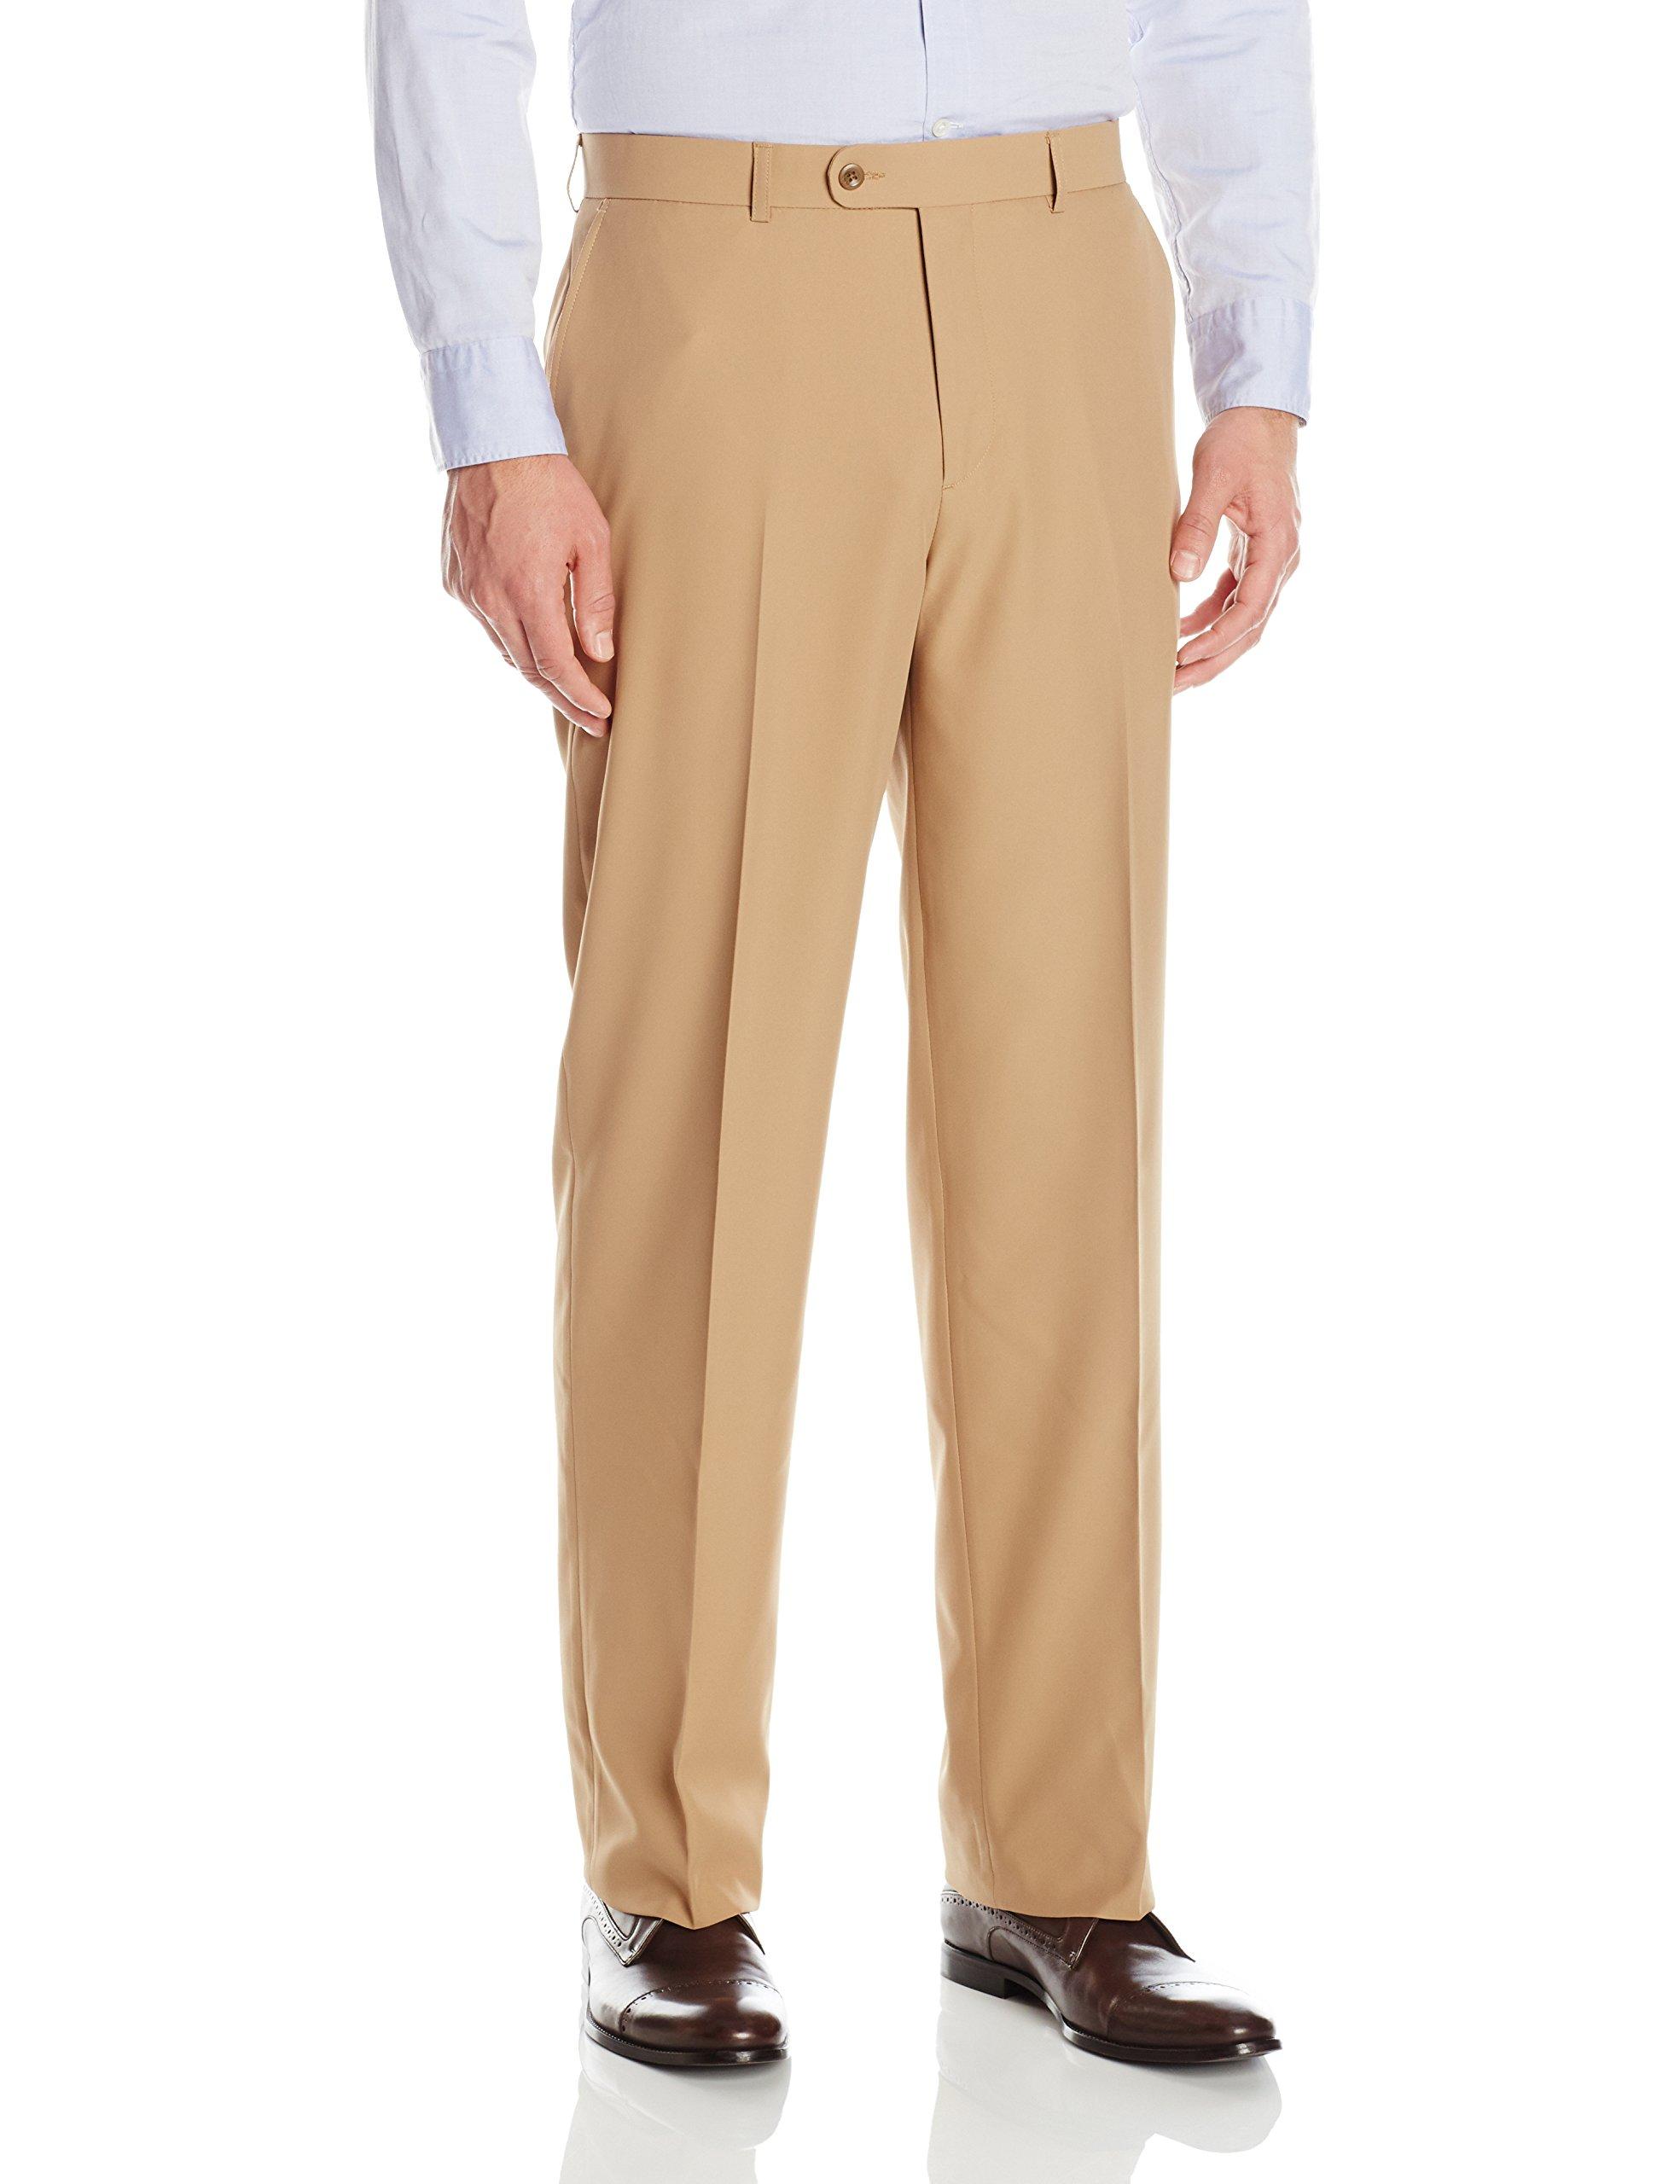 Linea Naturale Men's Flat Front Washable Microfiber Twill Trouser, Camel, 38W by Linea Naturale